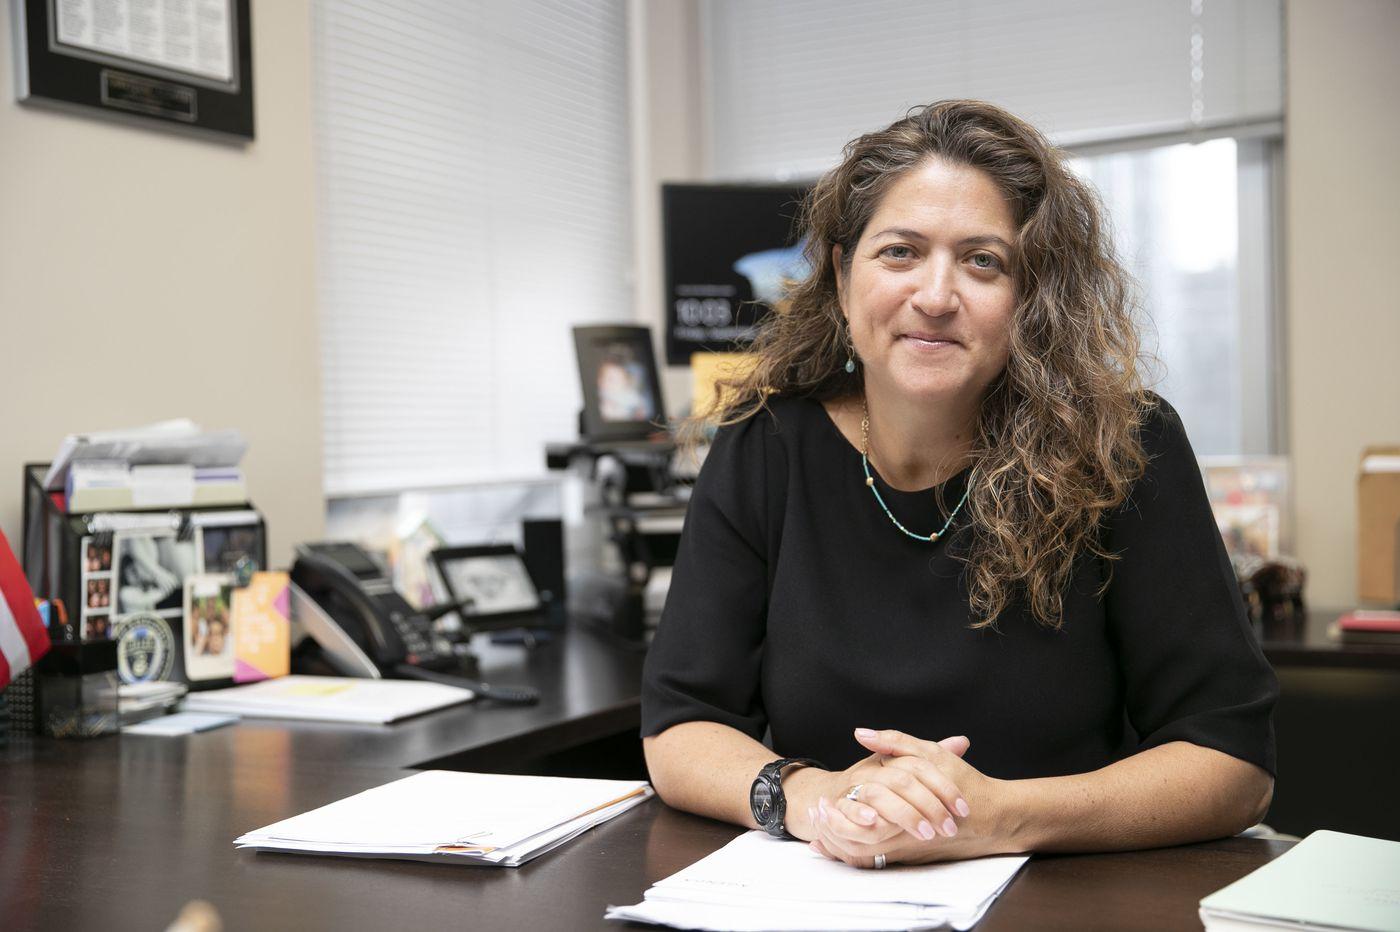 Meet the woman whose new job is to help Philadelphia kids